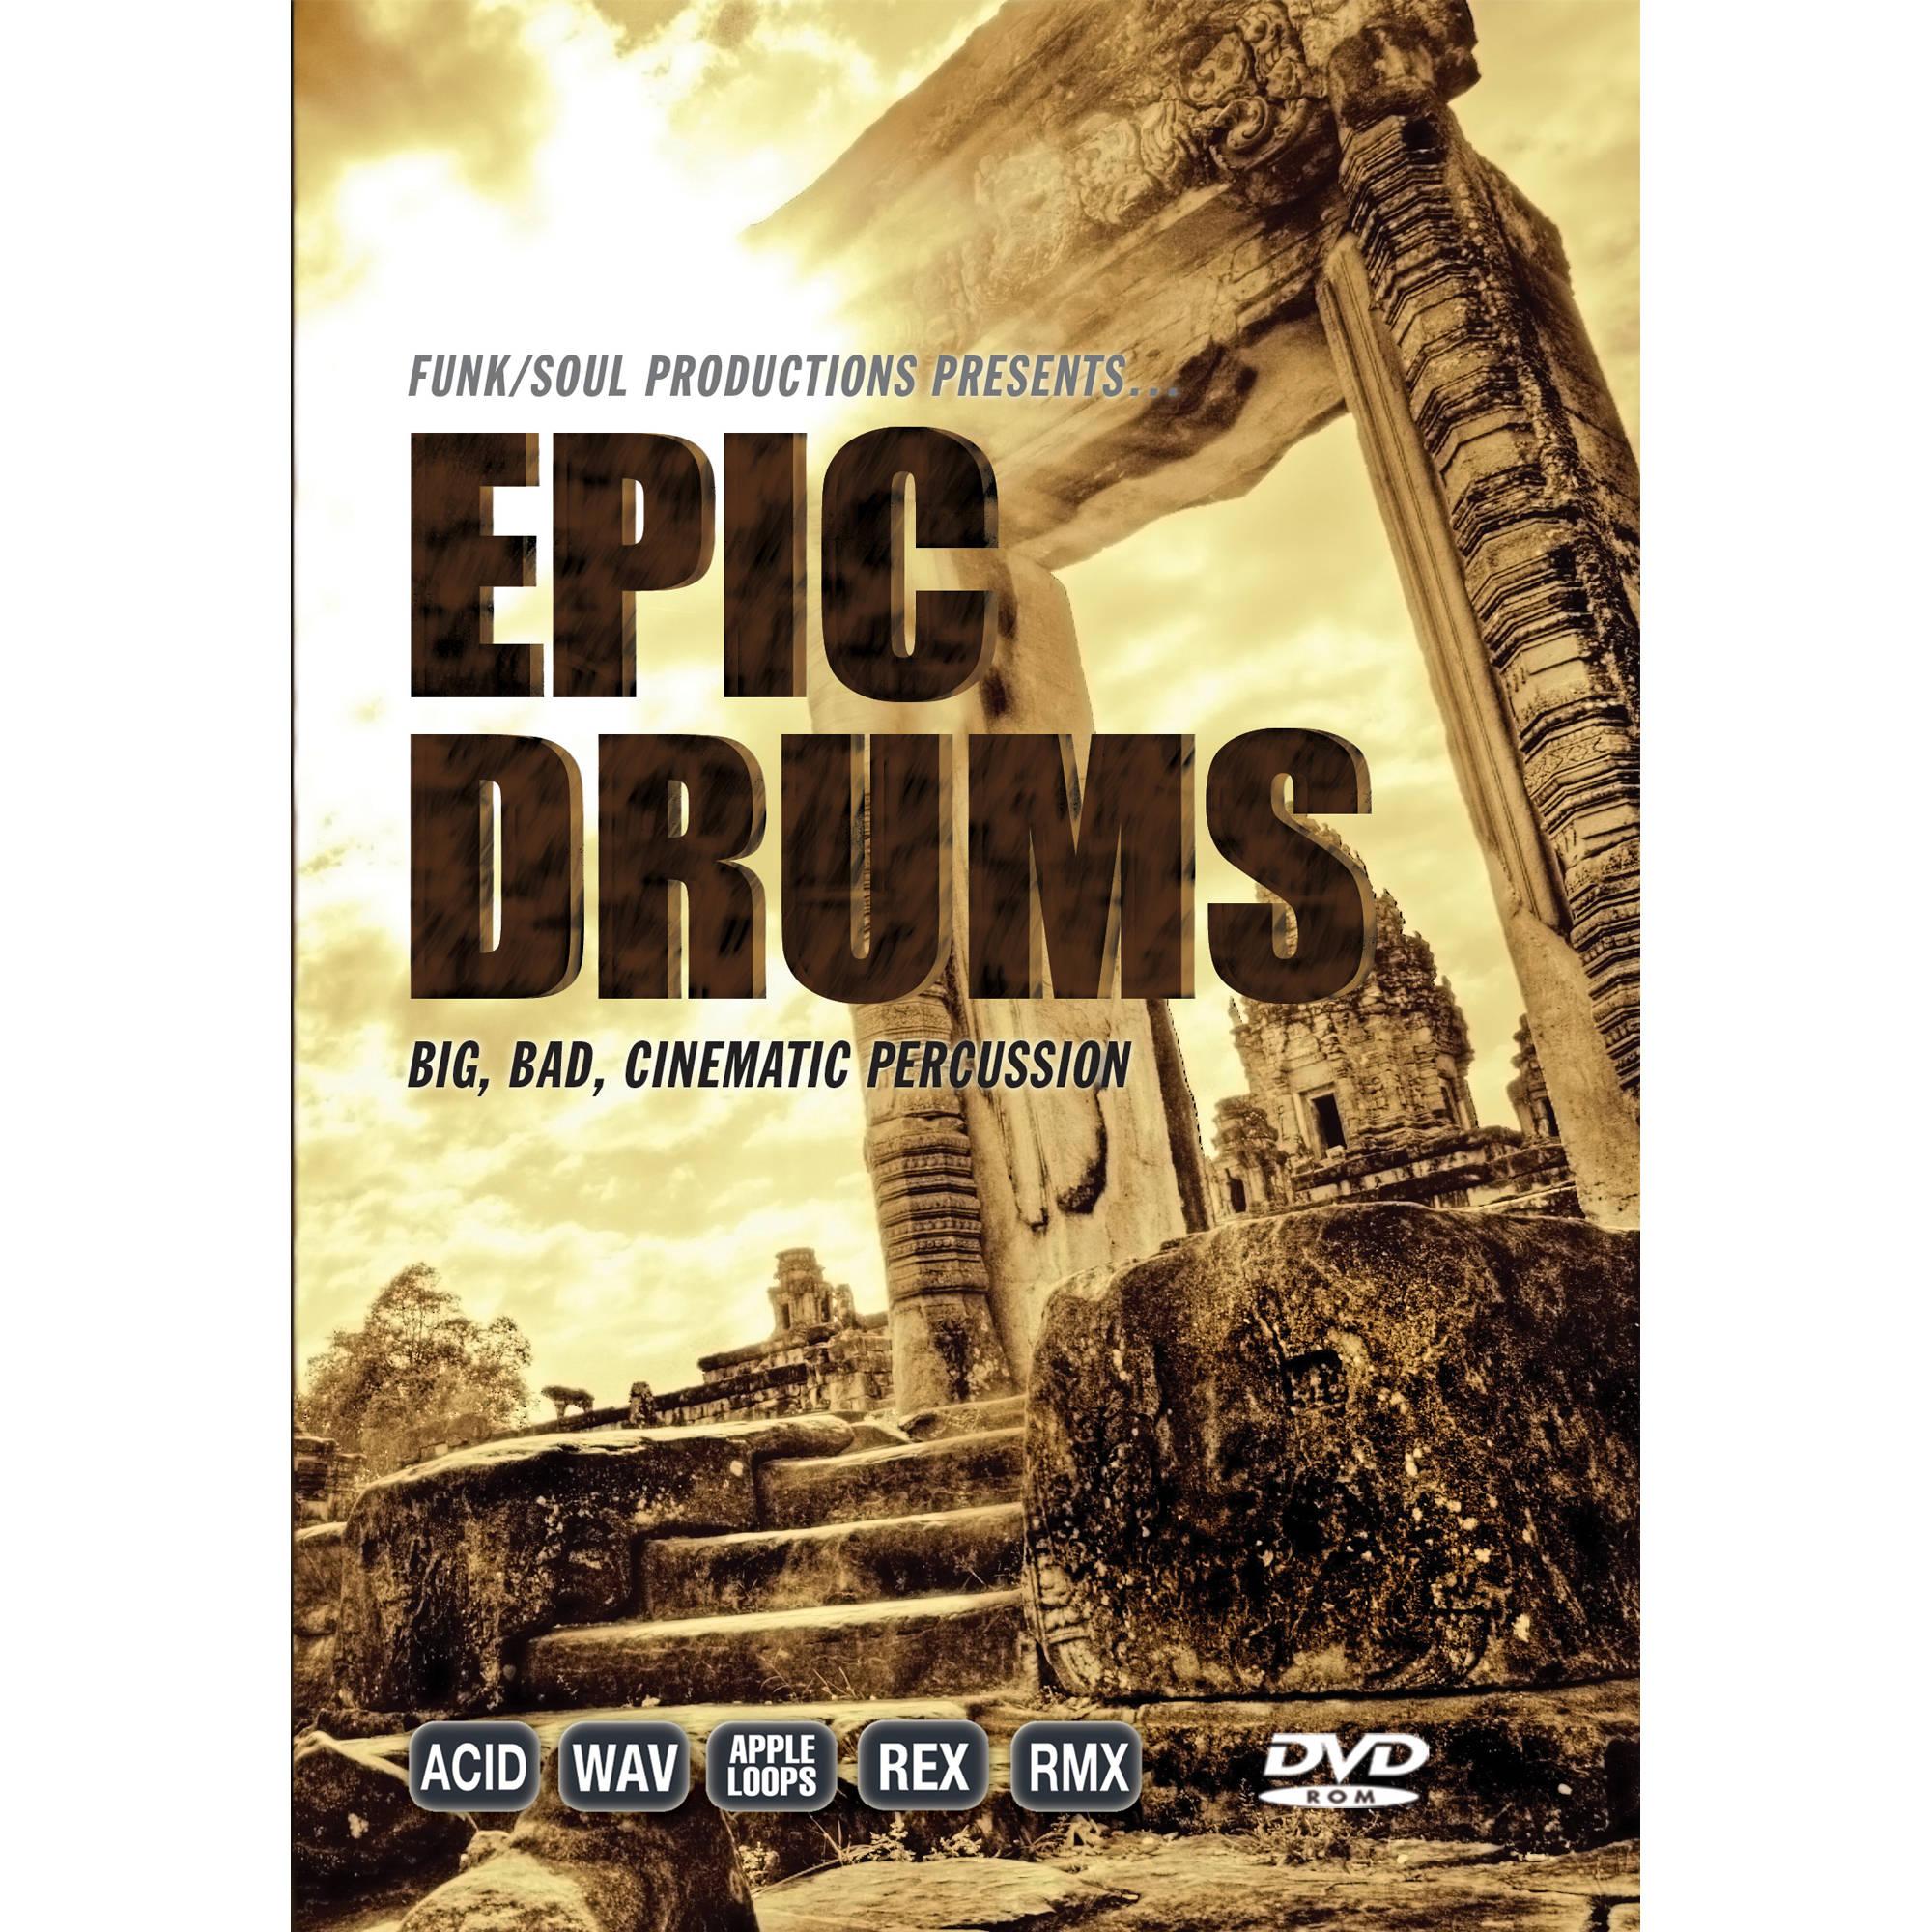 Big fish audio epic drums dvd epdr1 orwxz b h photo video for Big fish audio